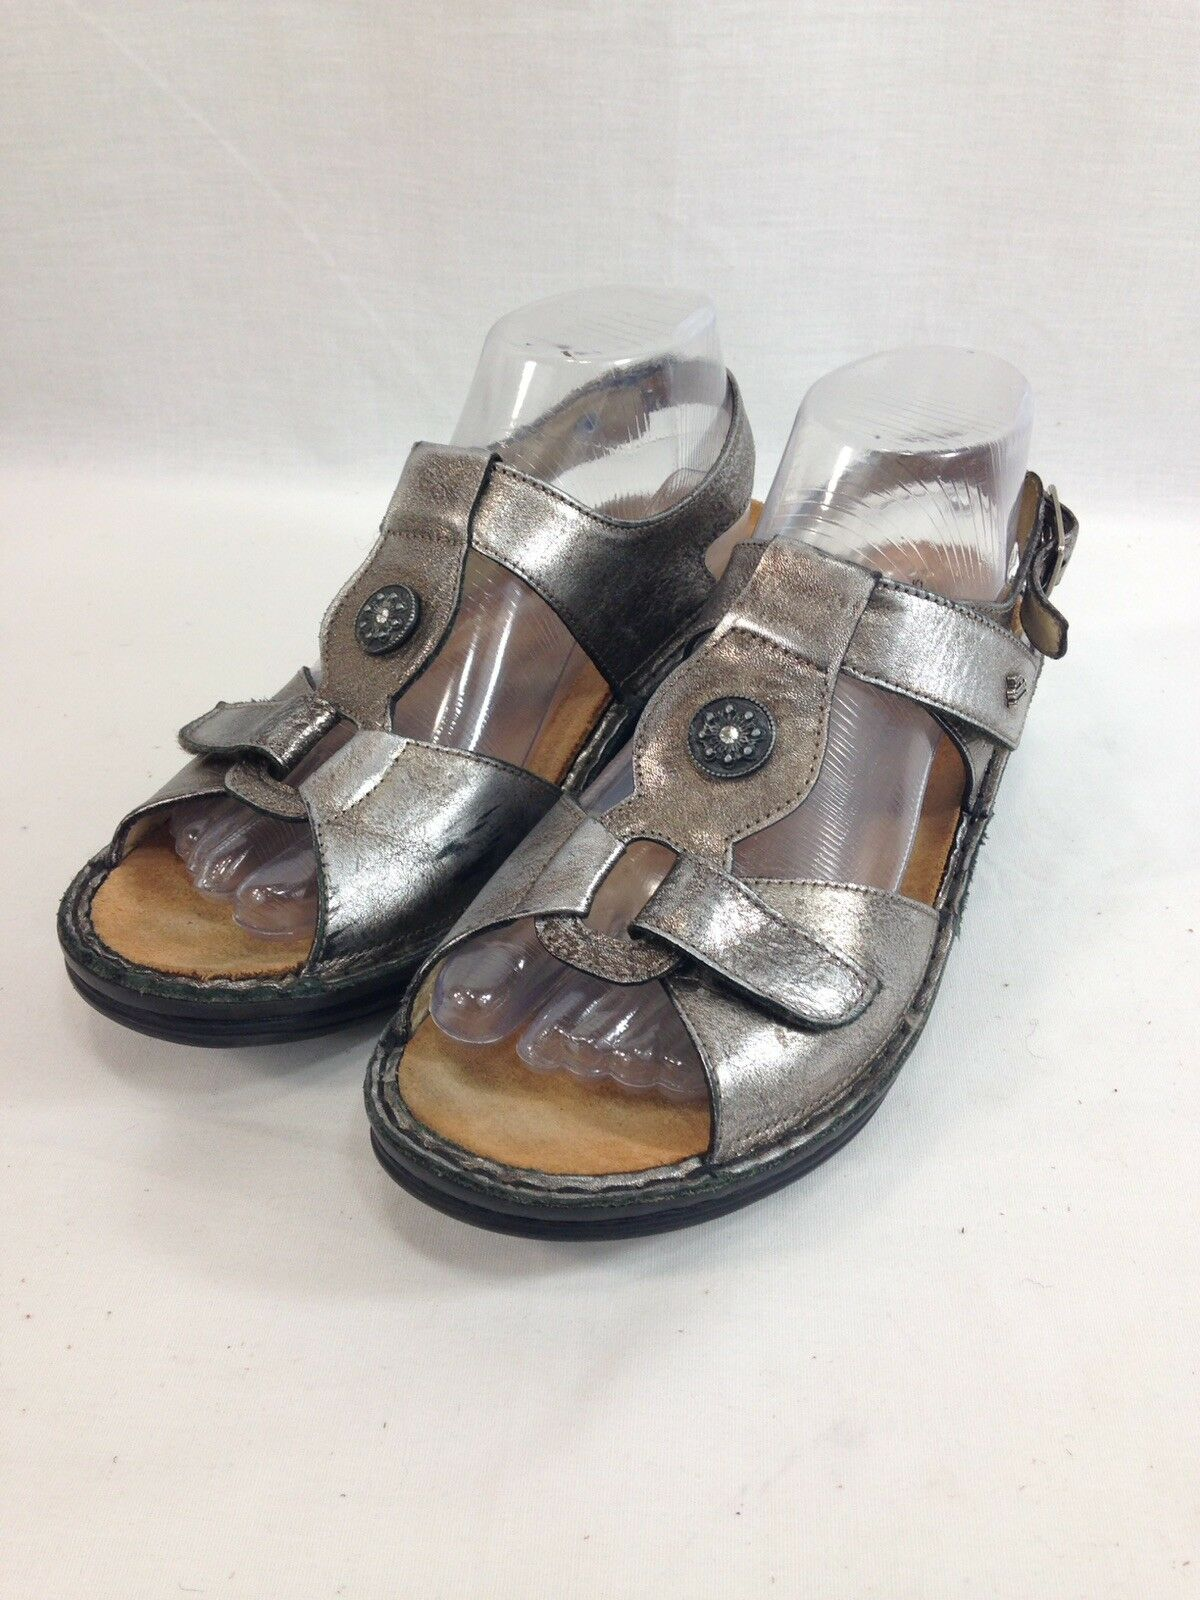 Finn Comfort Sandals chaussures femmes 7.5 D argent Adjustable Straps Germany